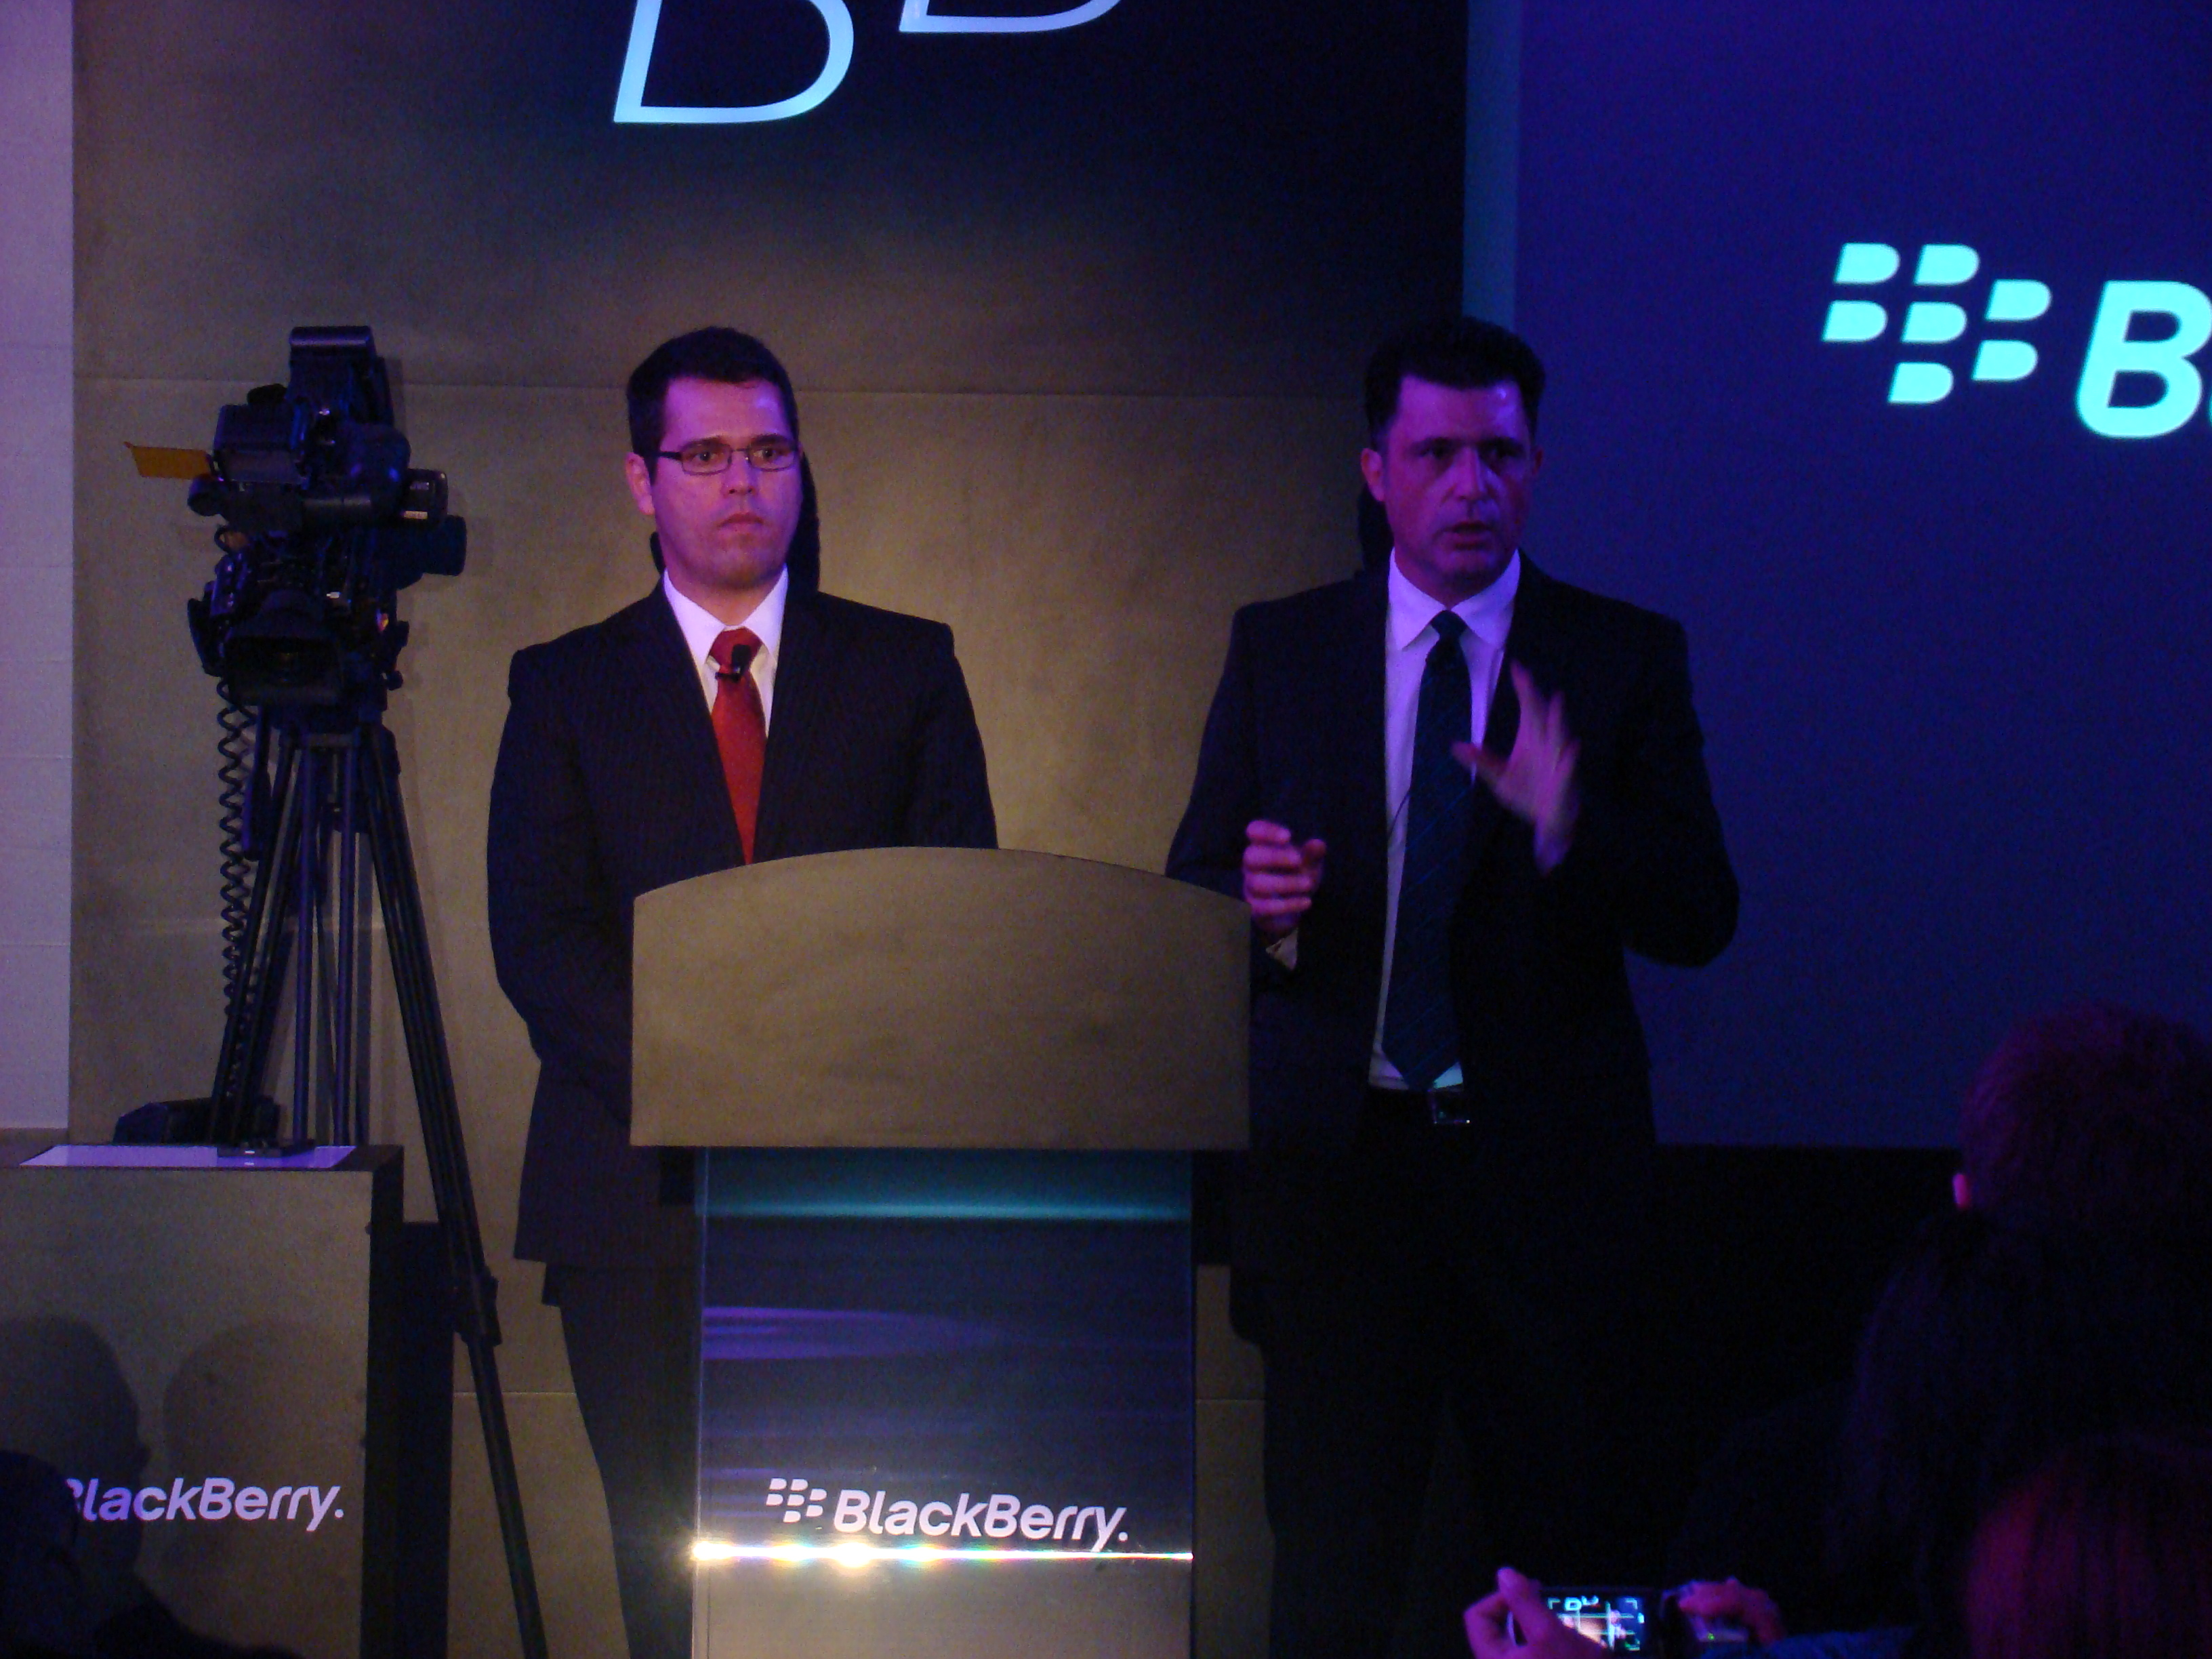 BlackBerry 10 4